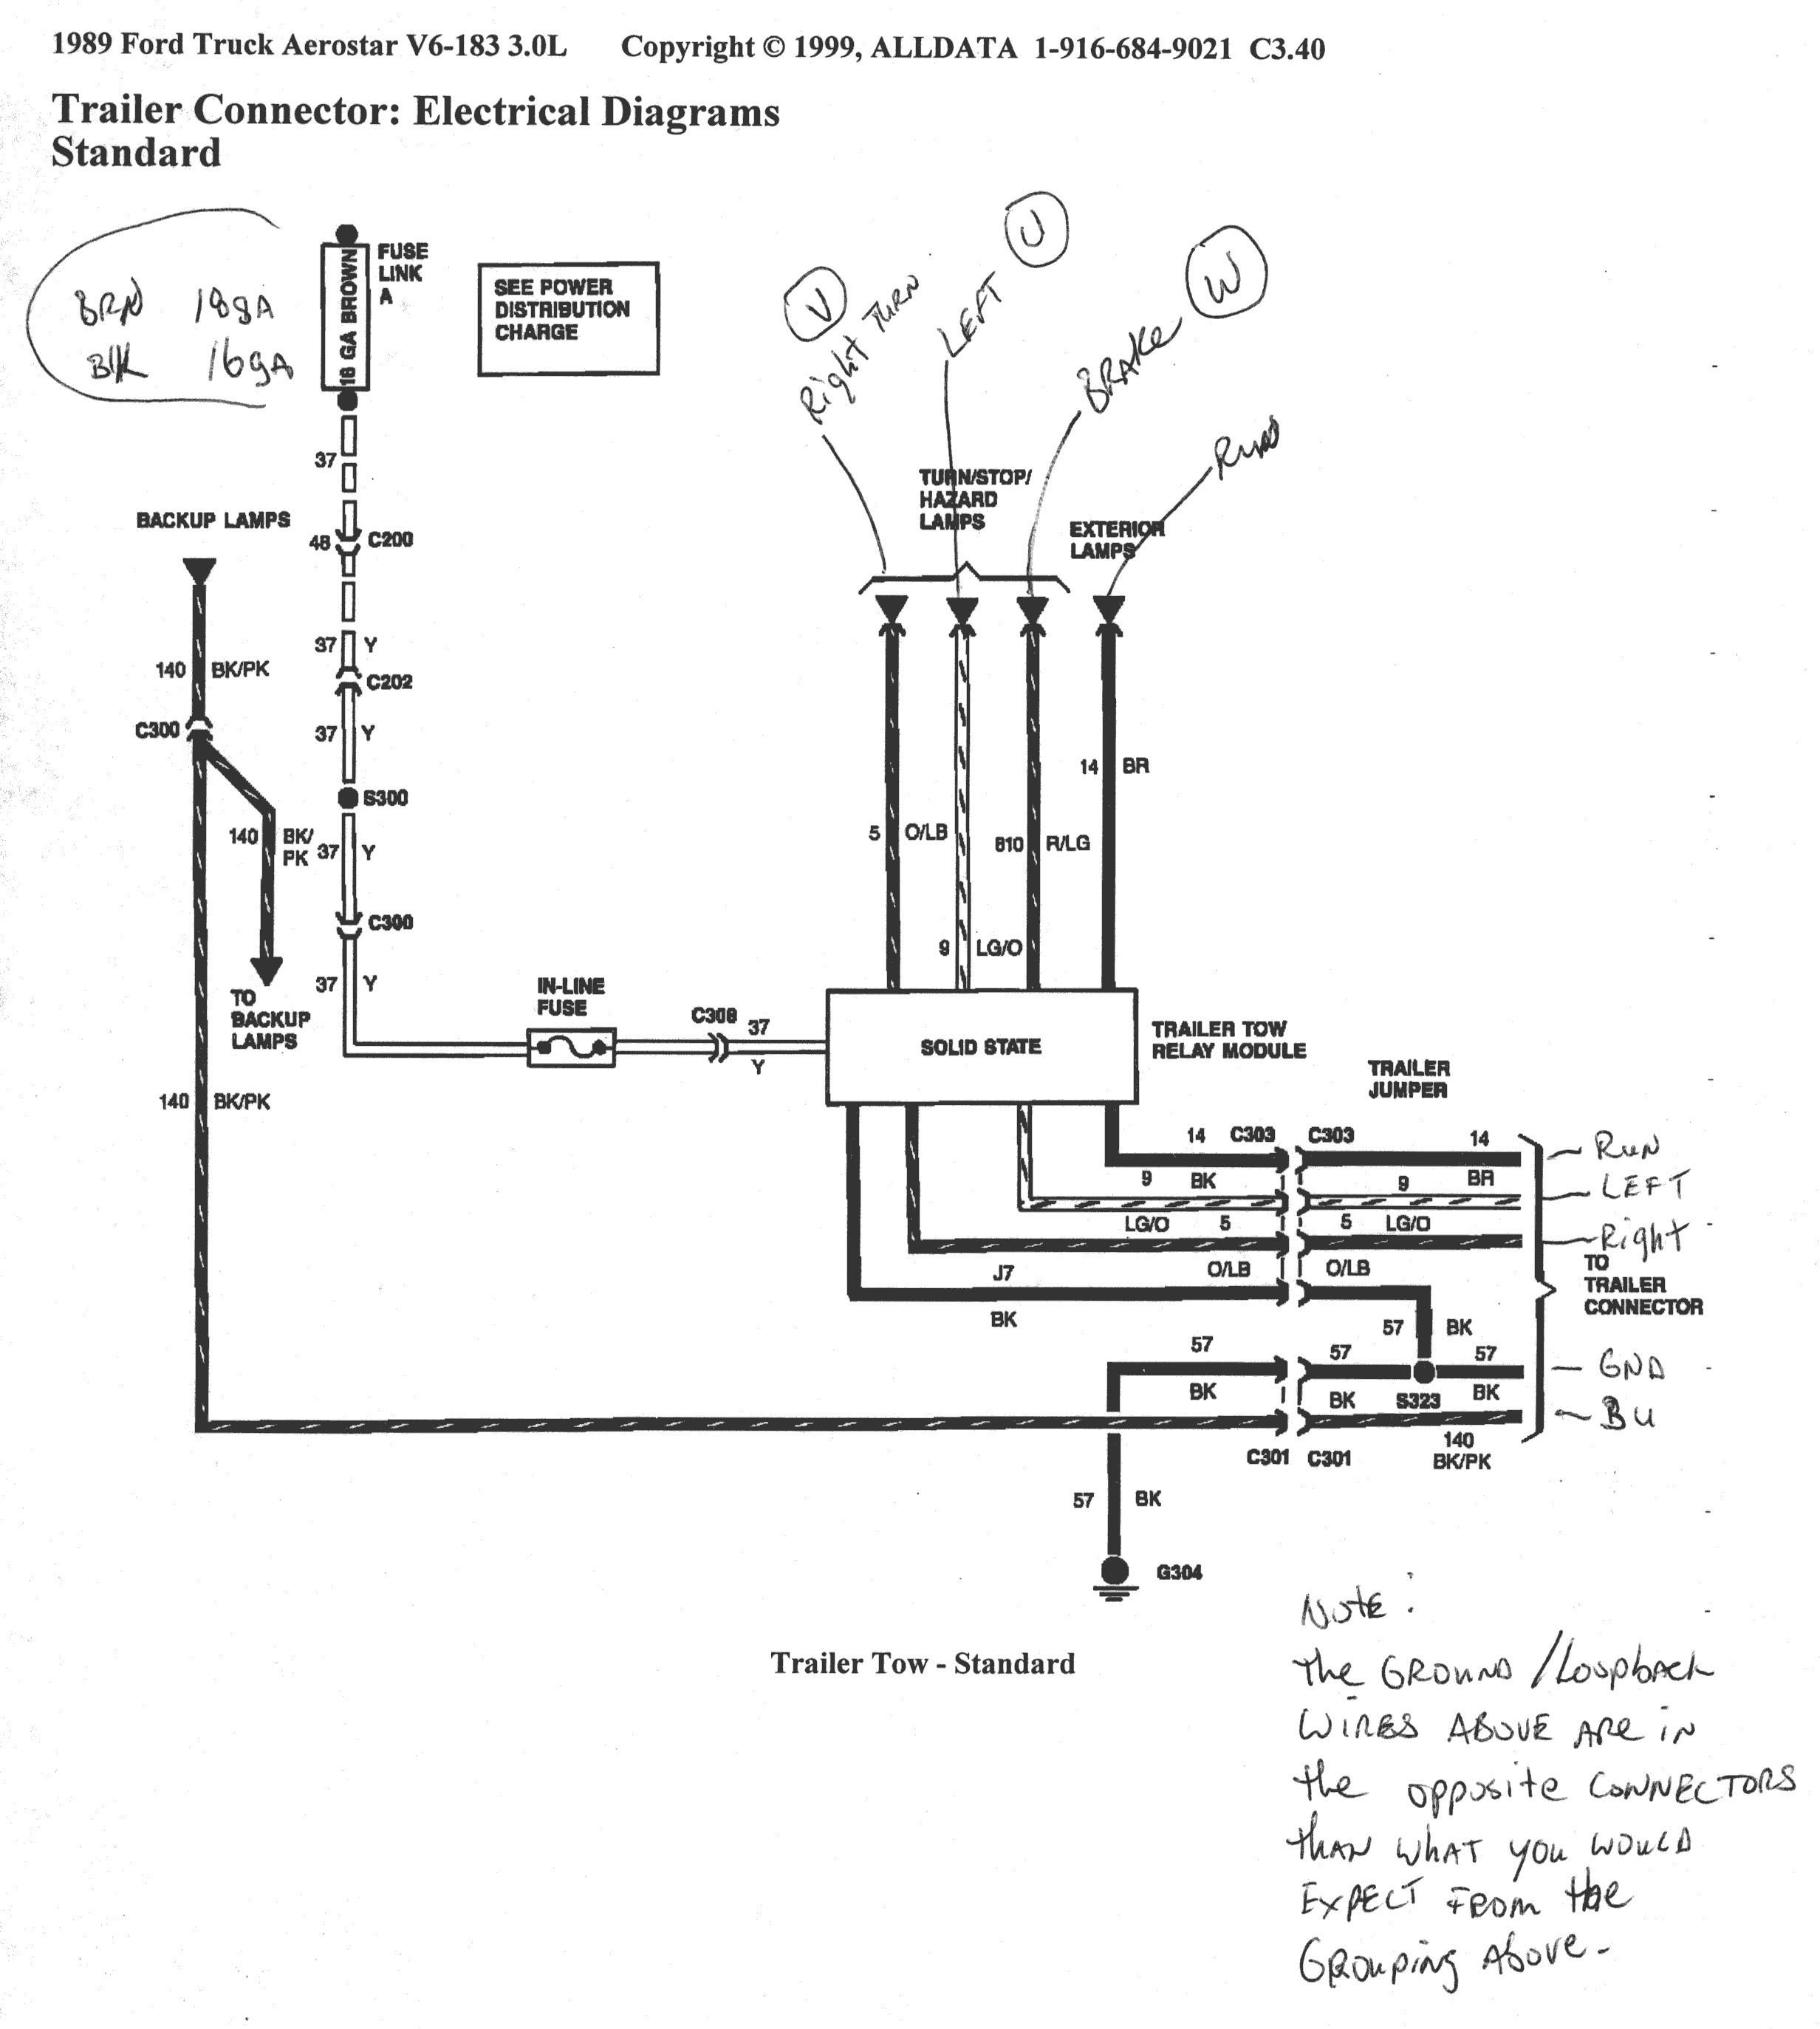 Wiring Diagram Trailer Board Valid Wiring Diagram for Trailer Tail Lights  New Tail Lights Wiring